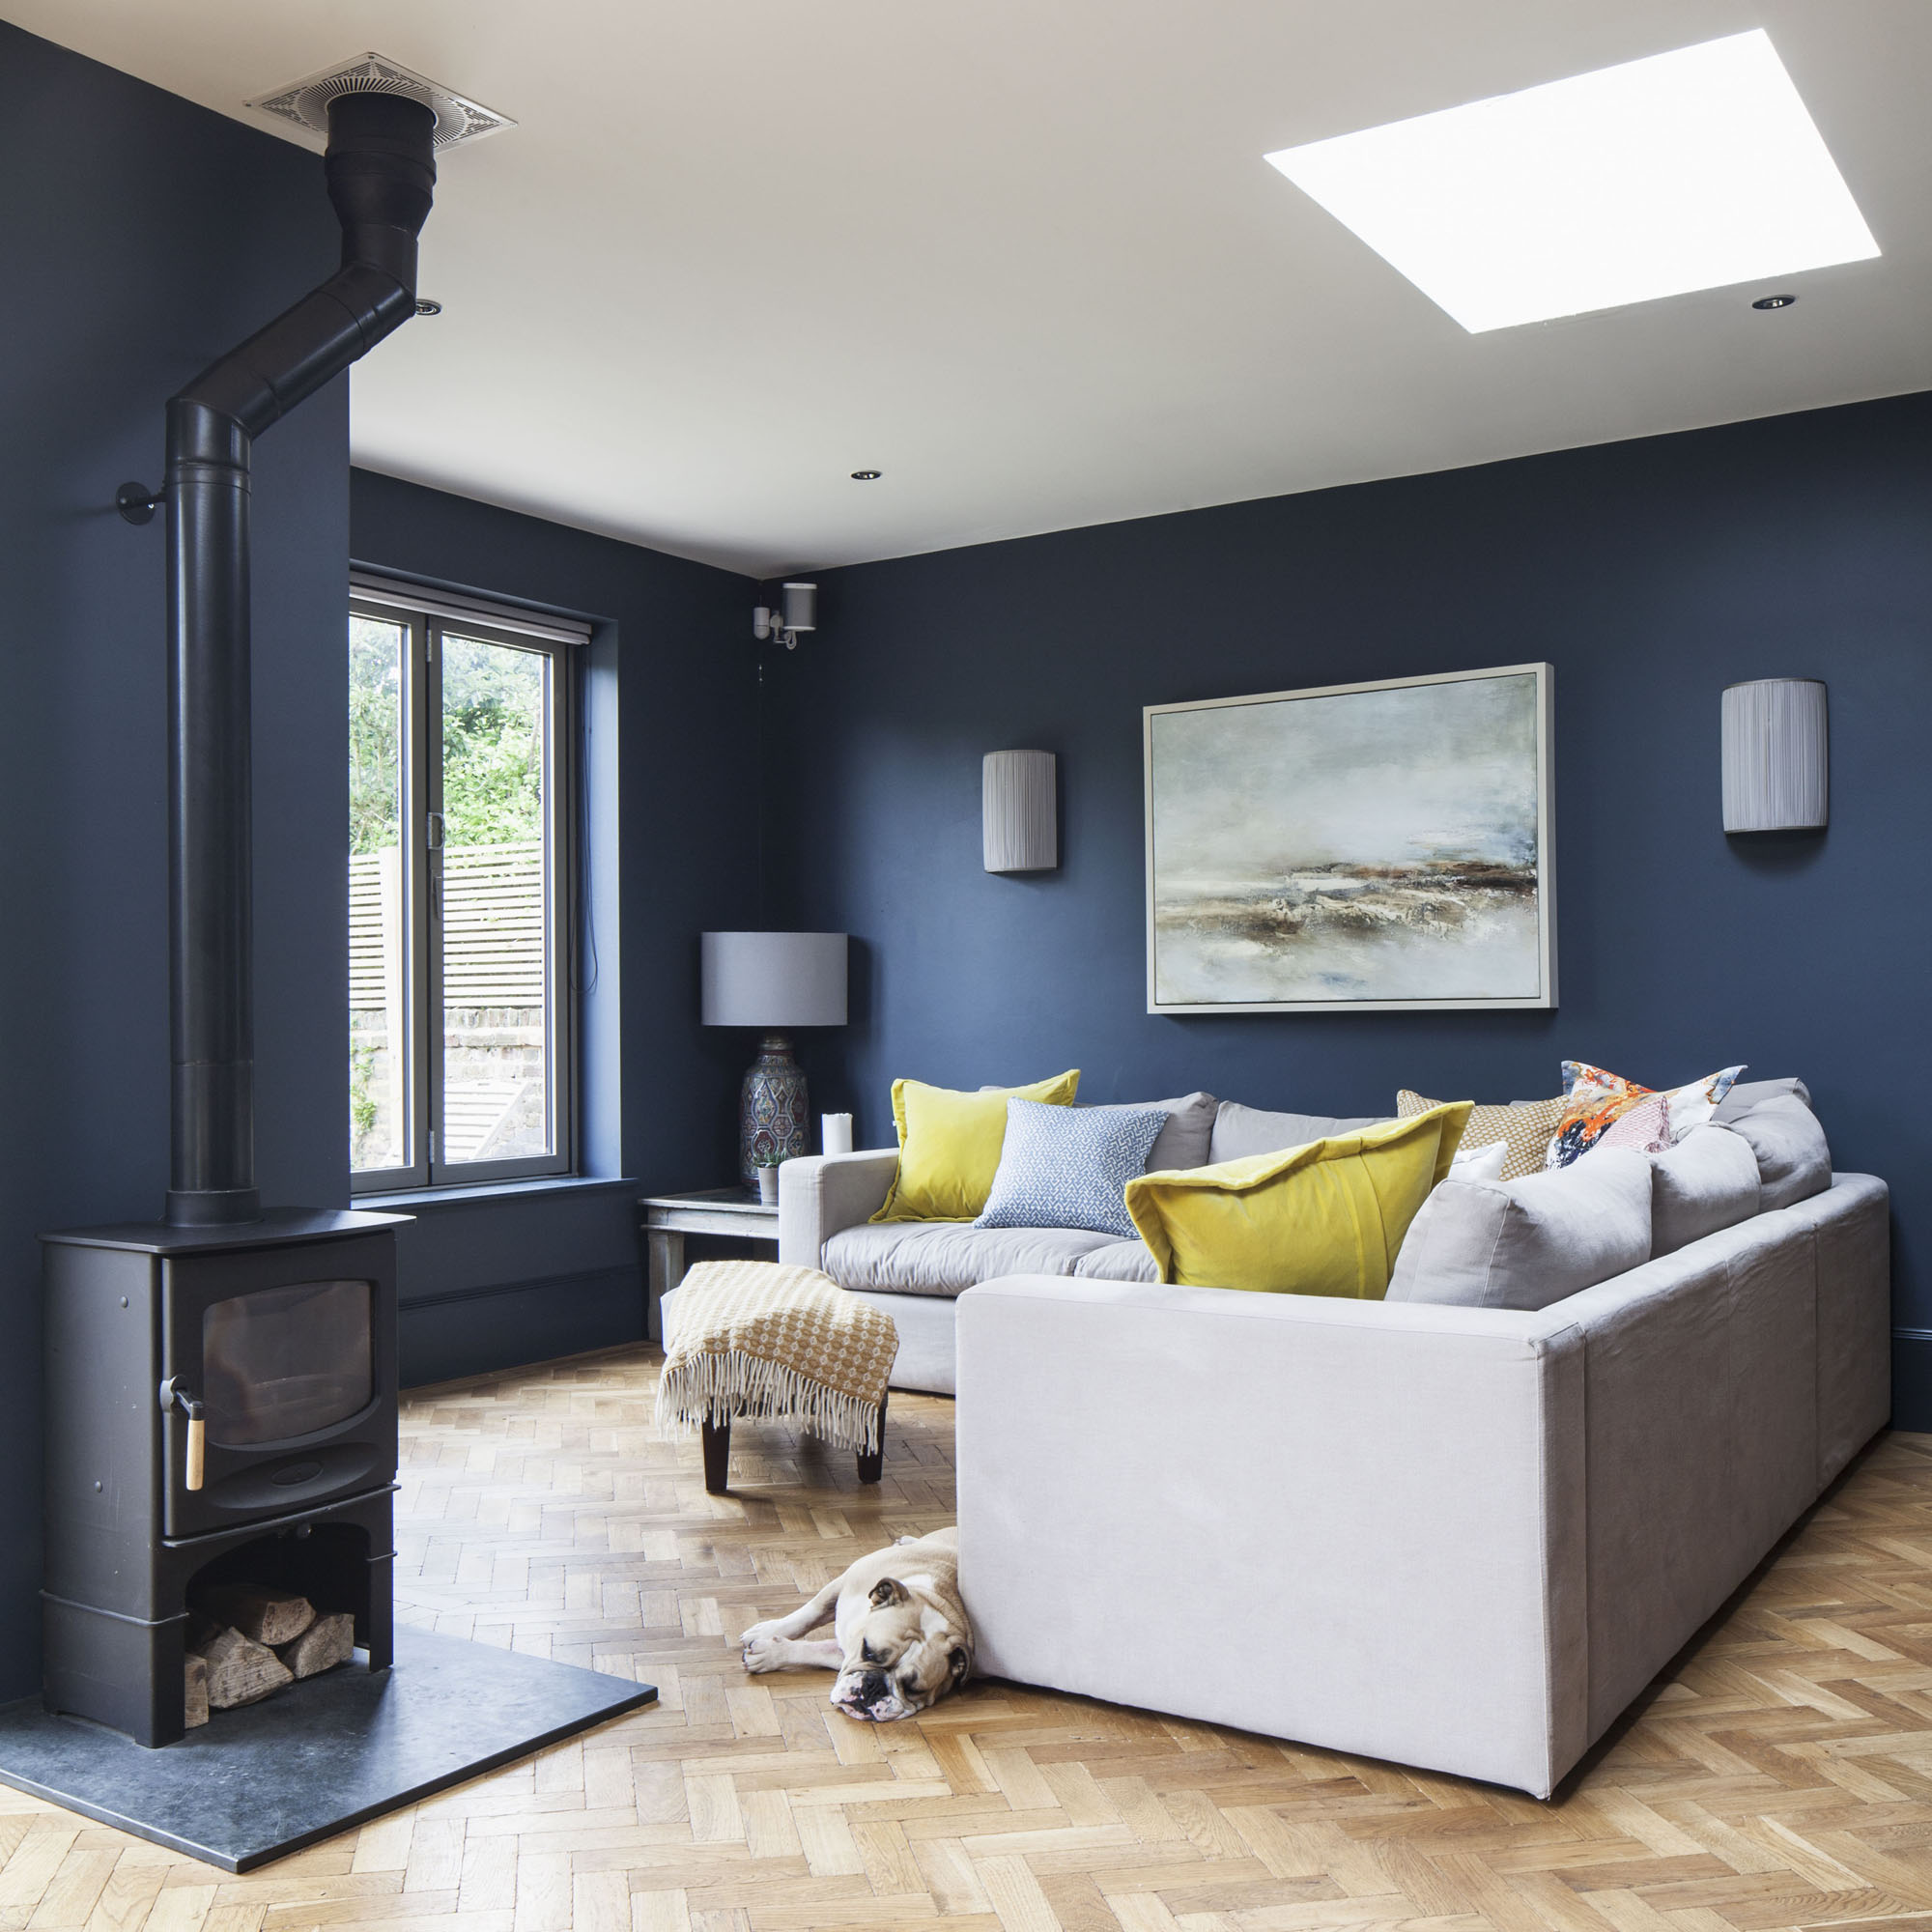 Kitchen Extension Ideas Living Room Interior Design F P